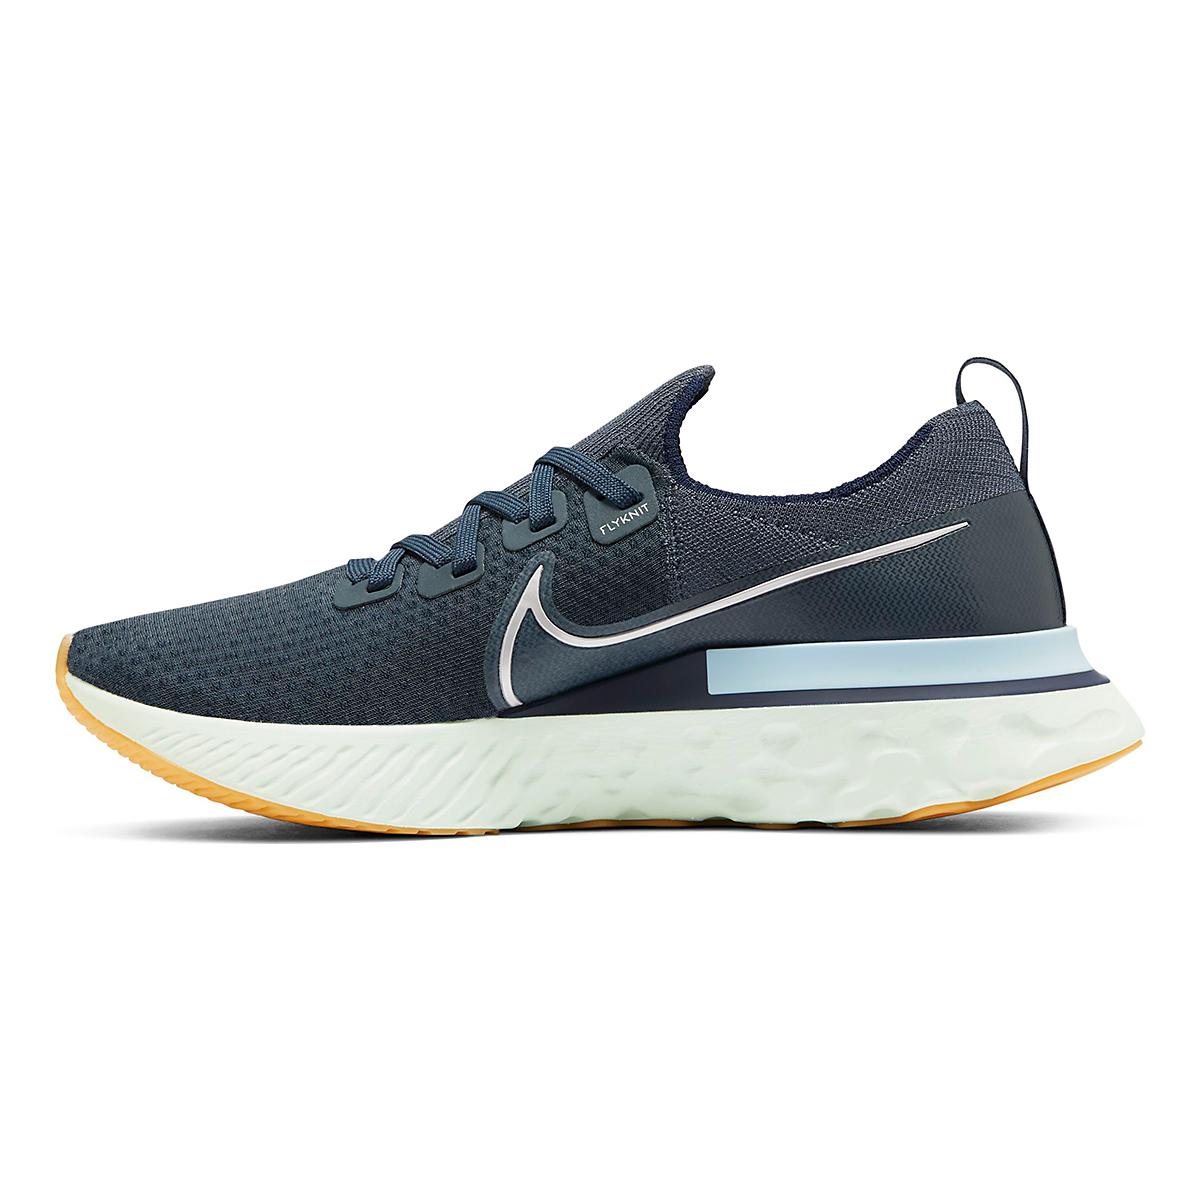 Men's Nike React Infinity Run Flyknit Running Shoe - Color: Blue Fox/Metallic Silver - Size: 6 - Width: Regular, Blue Fox/Metallic Silver, large, image 2